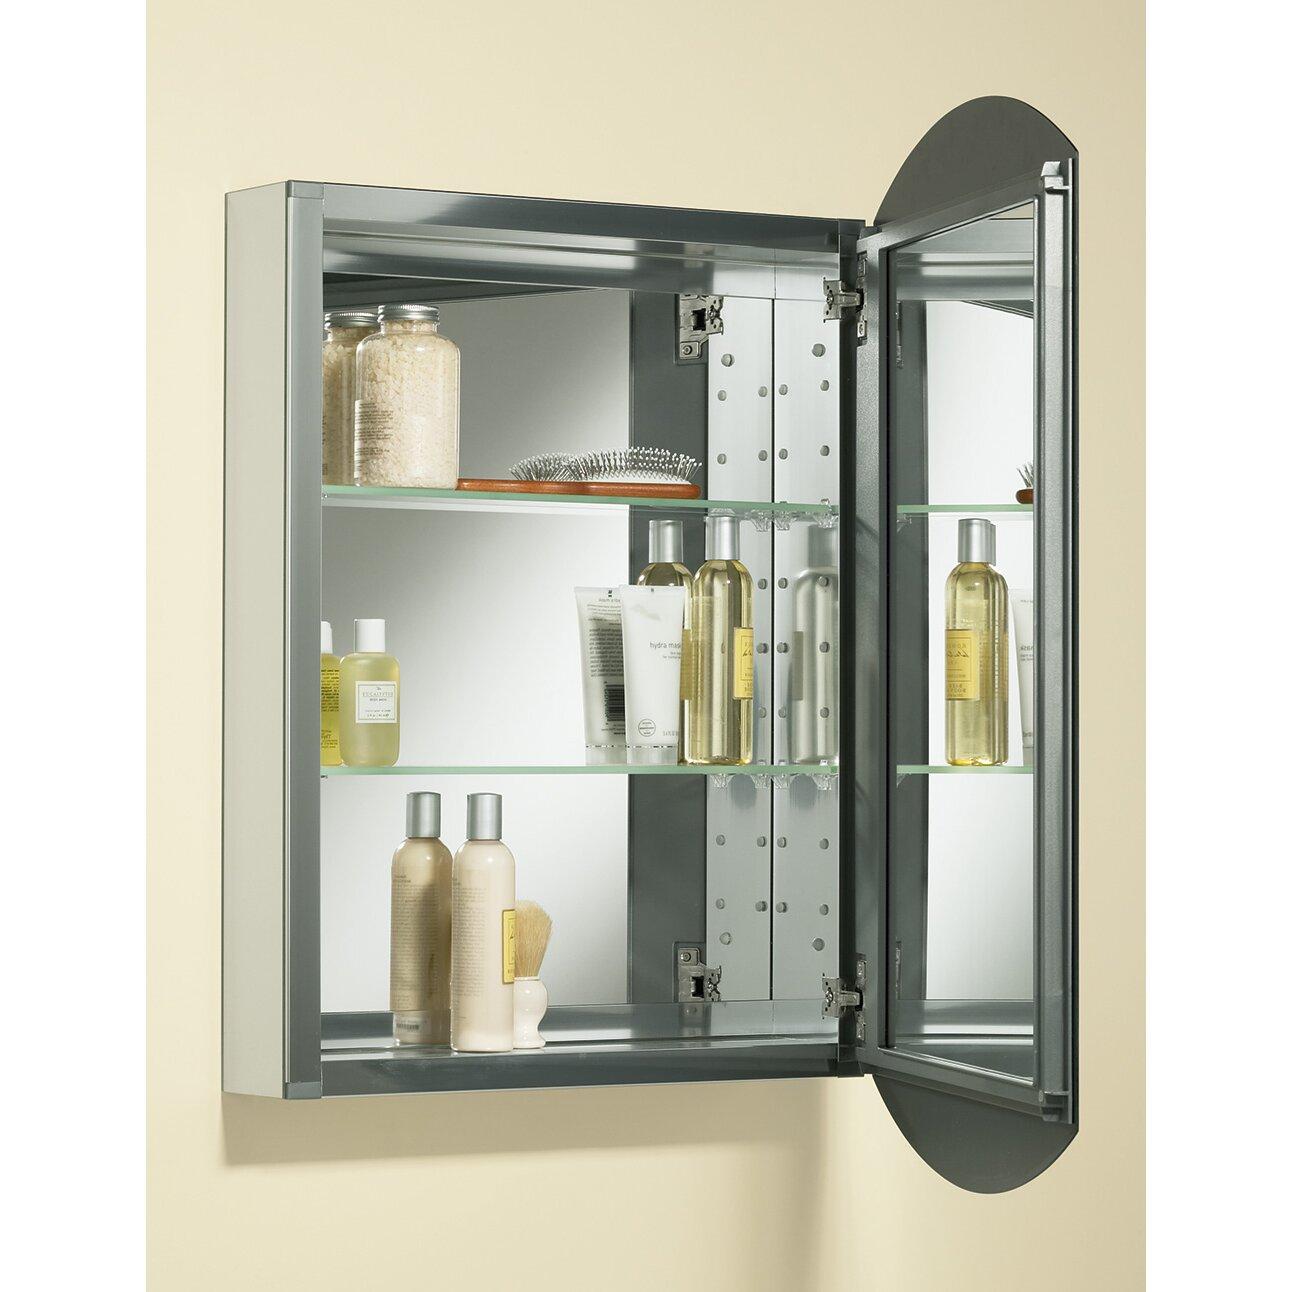 Kohler Bathroom Mirror Kohler Archer 20 X 31 Aluminum Wall Mount Medicine Cabinet With